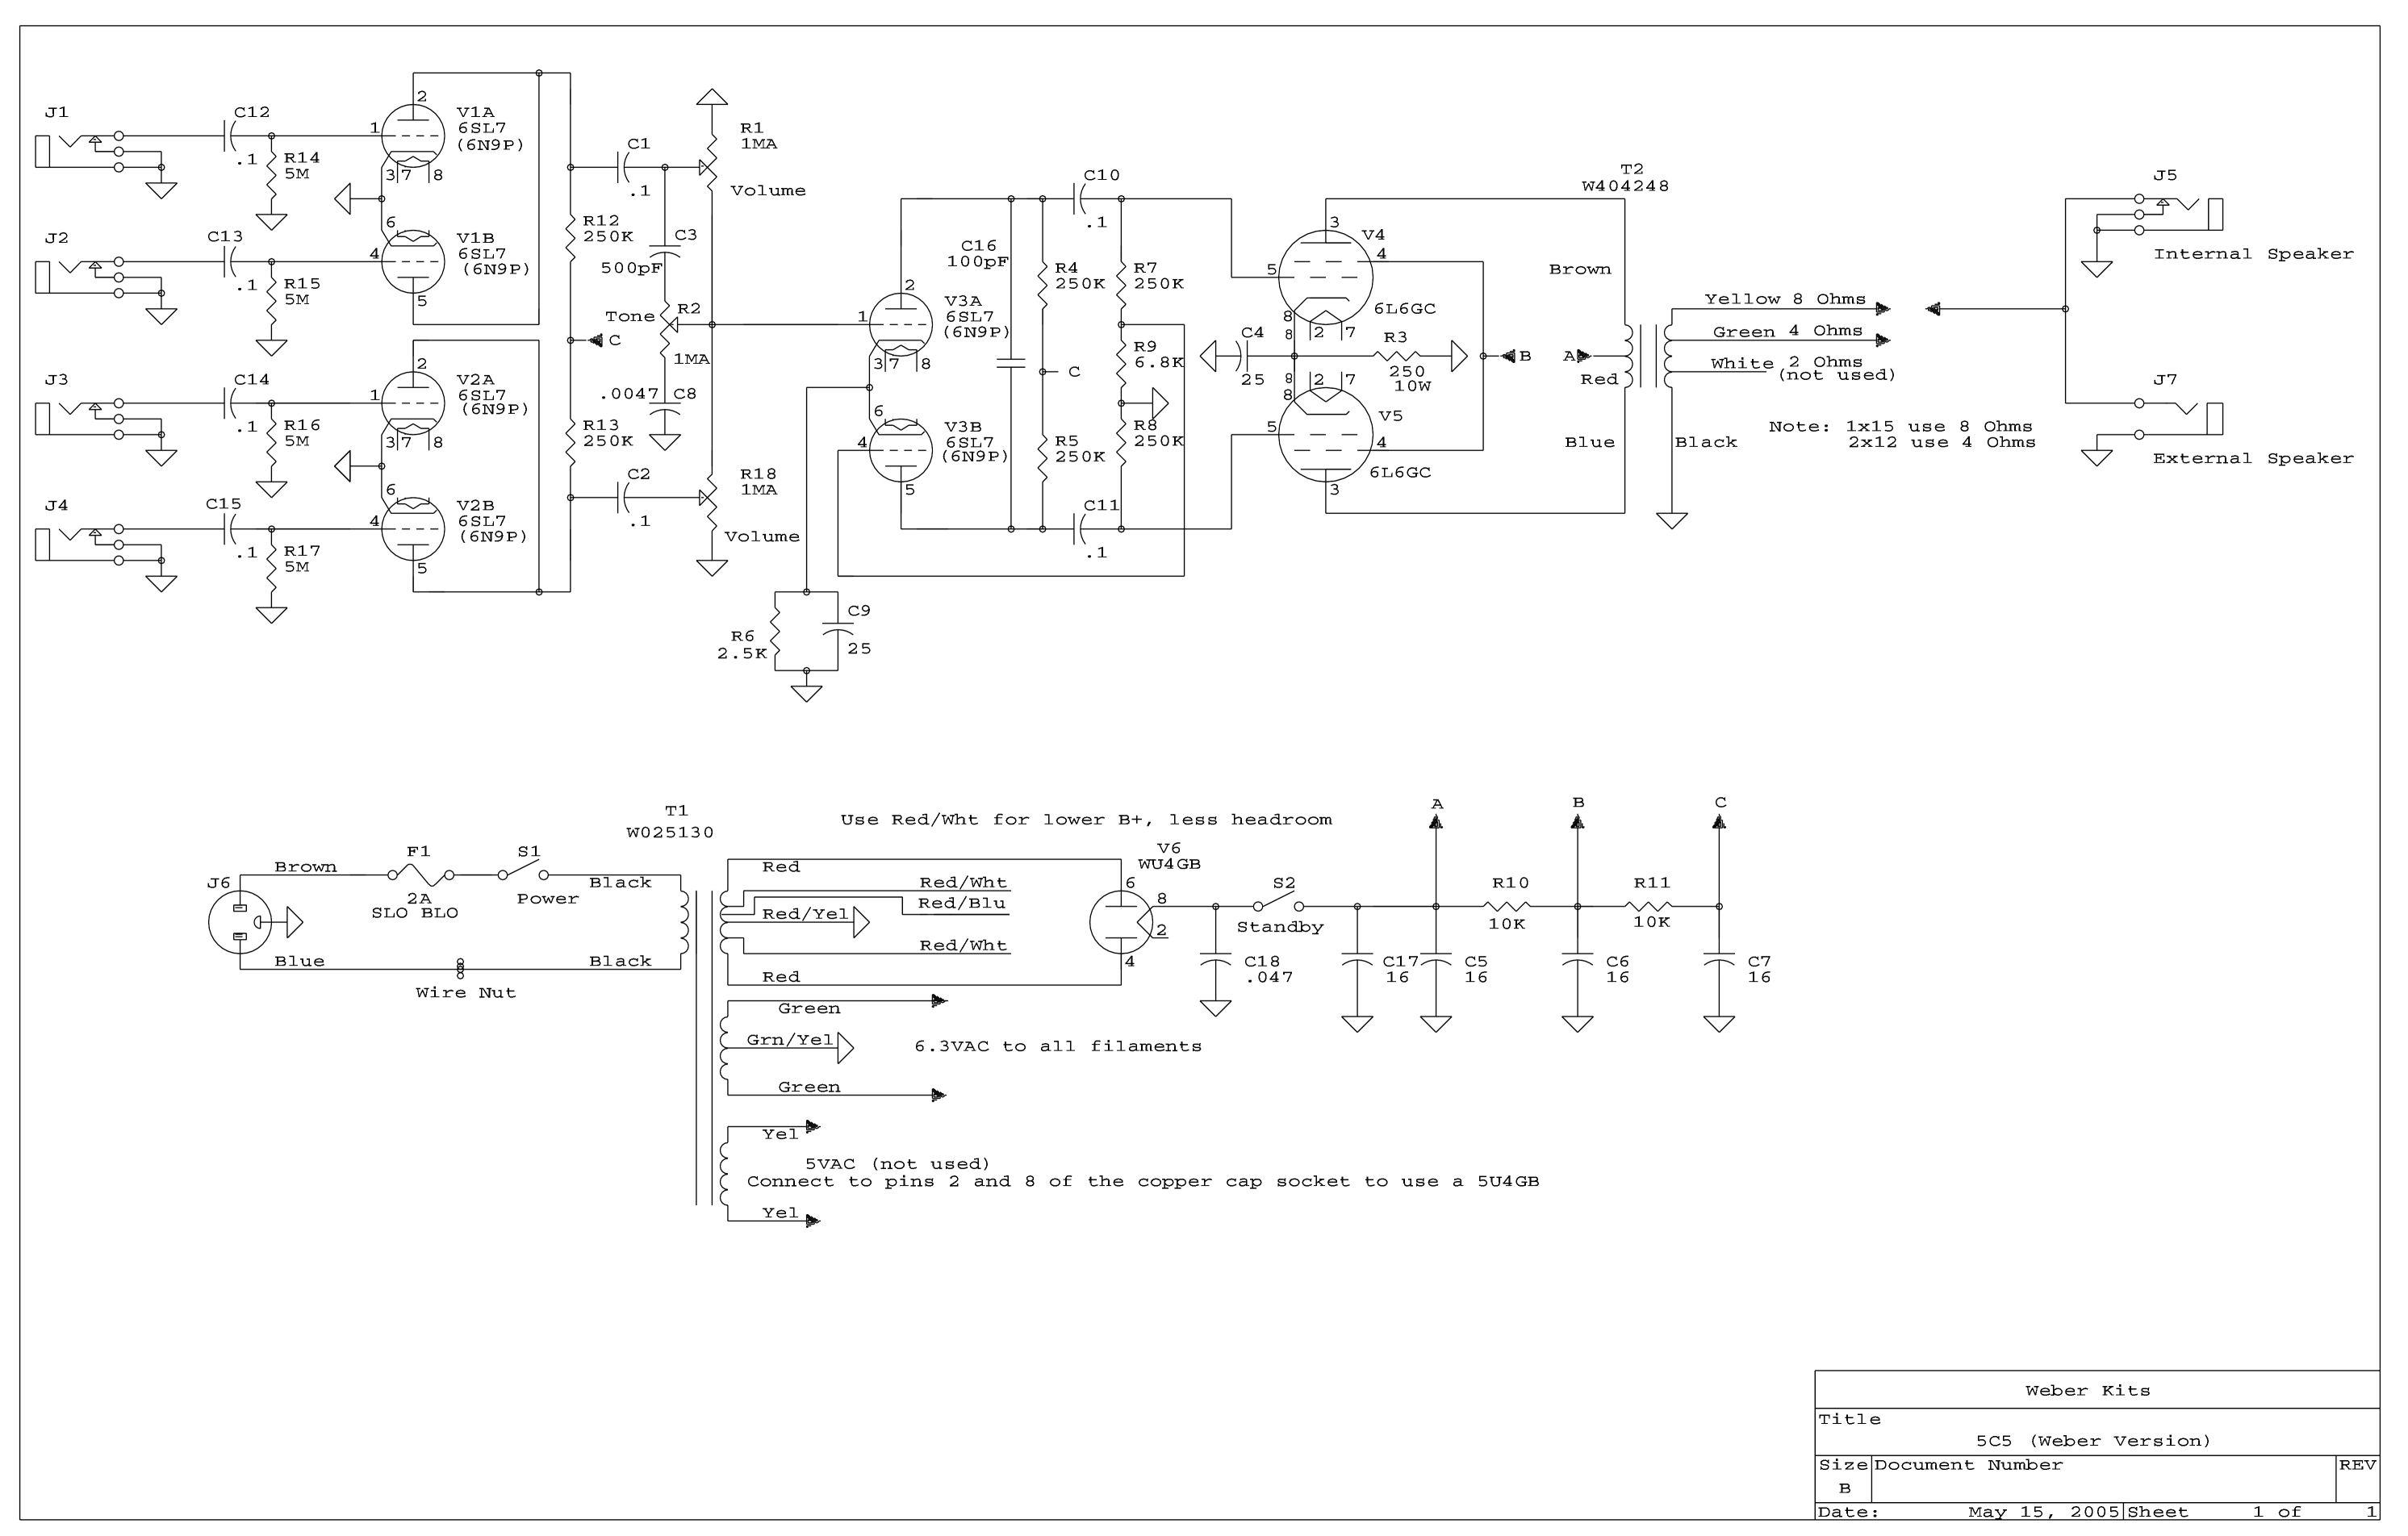 DIY Kits Z Wreck Schematic on